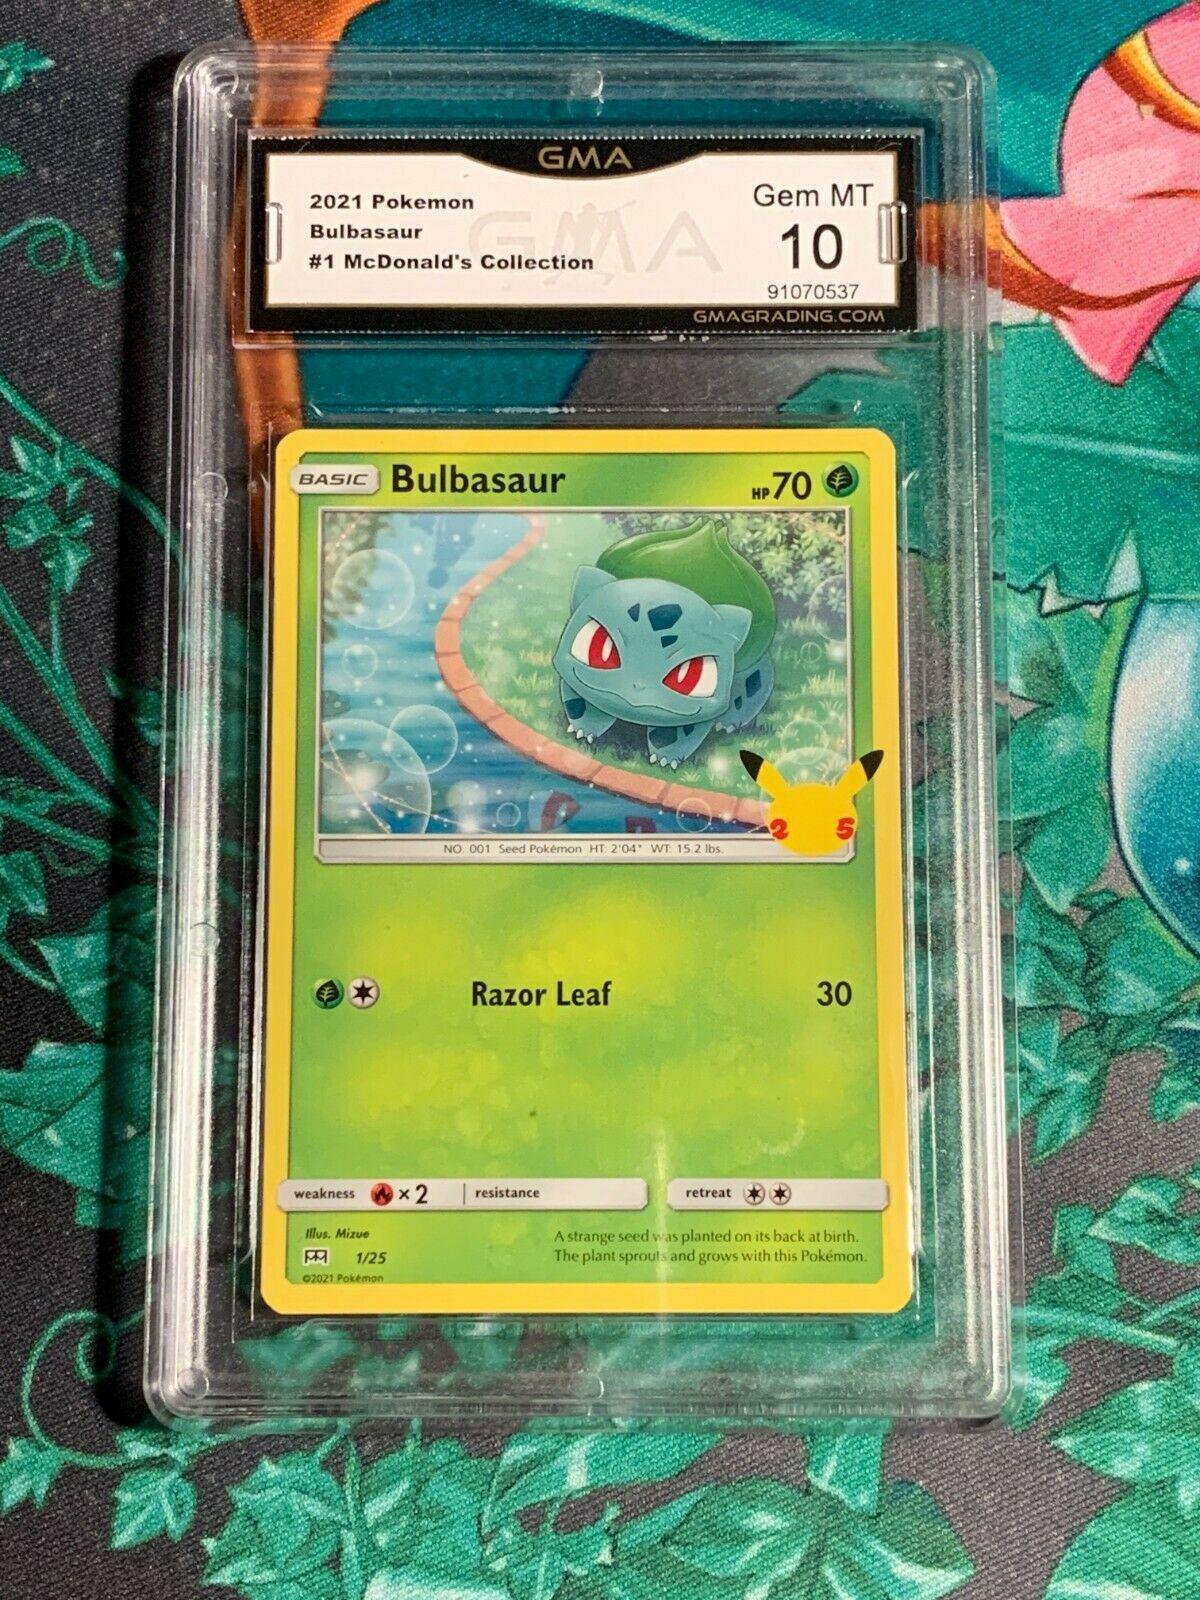 Bulbasaur 1/25 GMA 10 Pokemon 2021 McDonald's Collection Graded card slab